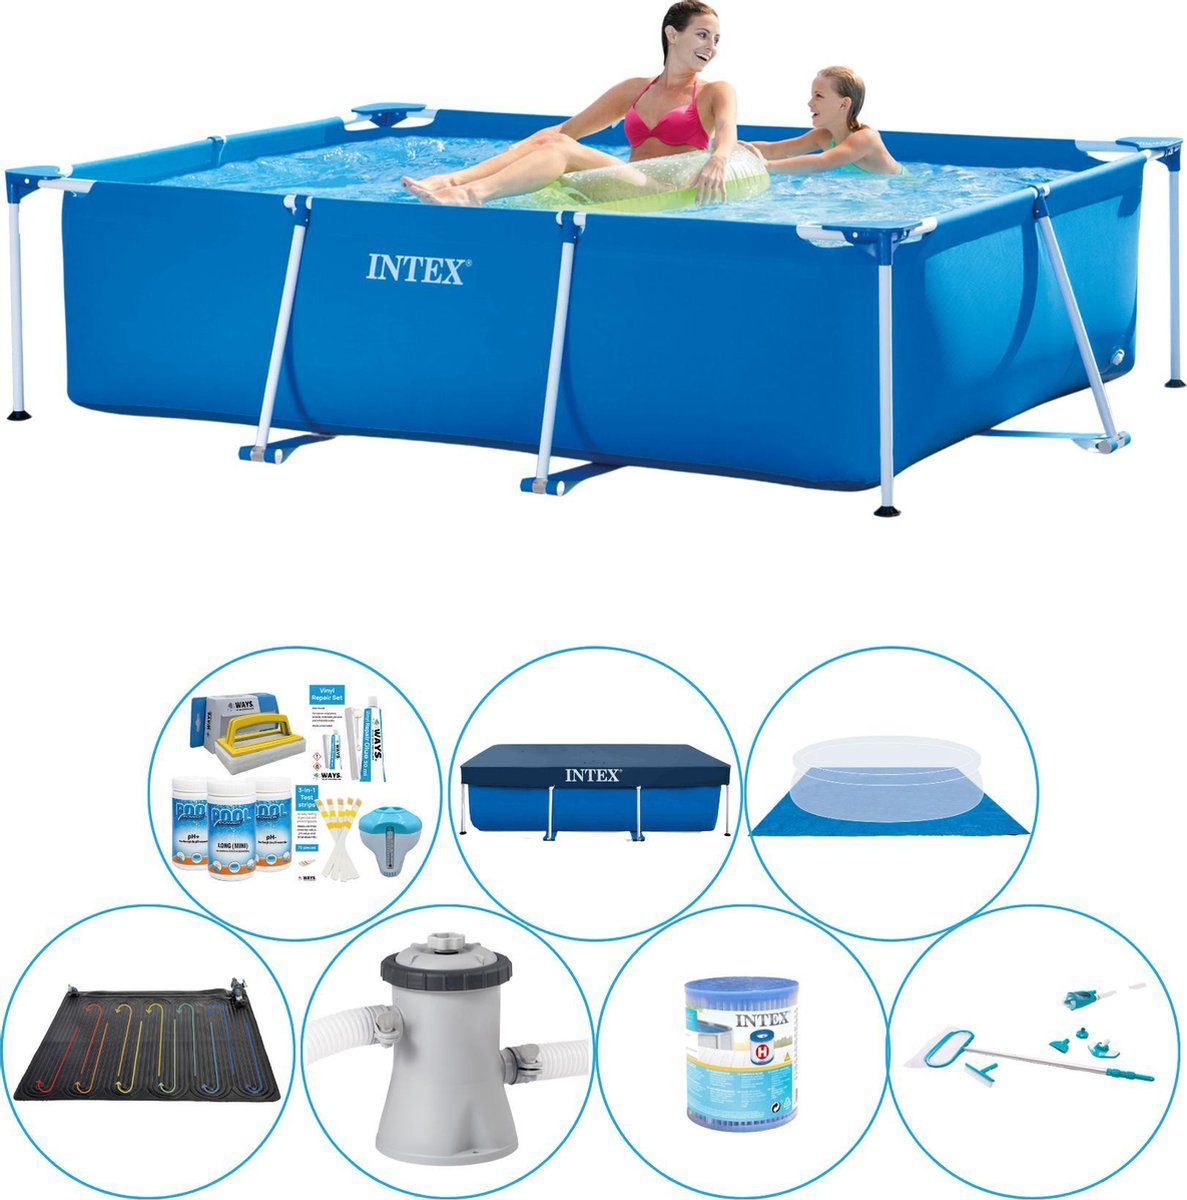 Intex Frame Pool Zwembad - 220 x 150 x 60 cm - Voordeelset